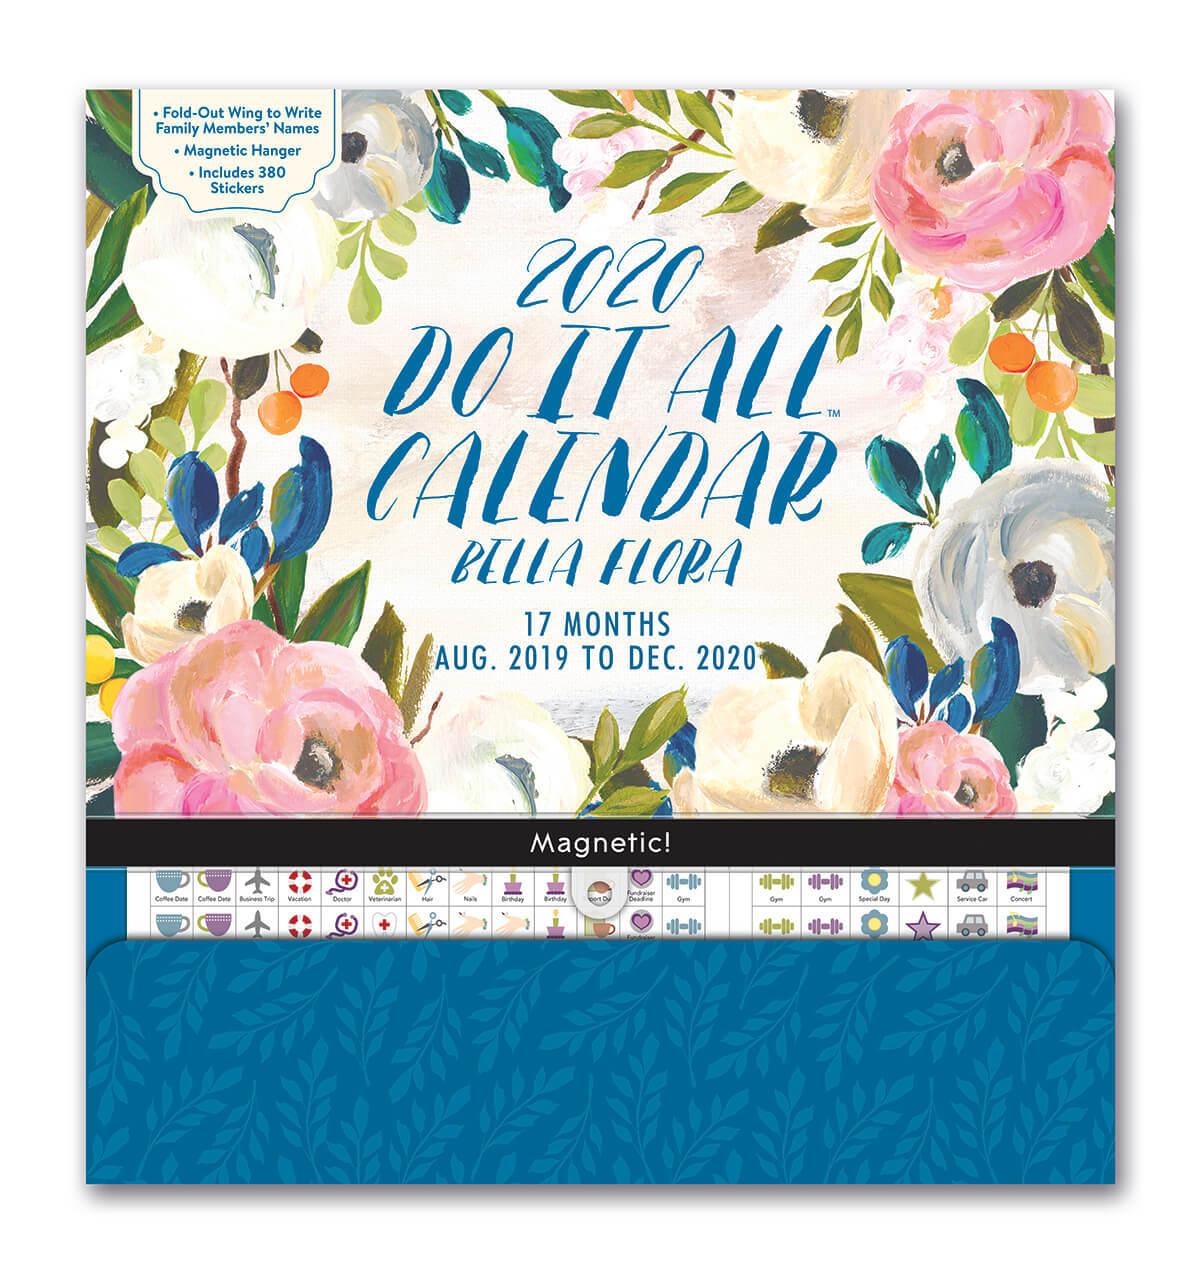 Bella Flora 2020 Do It All Wall Calendar image